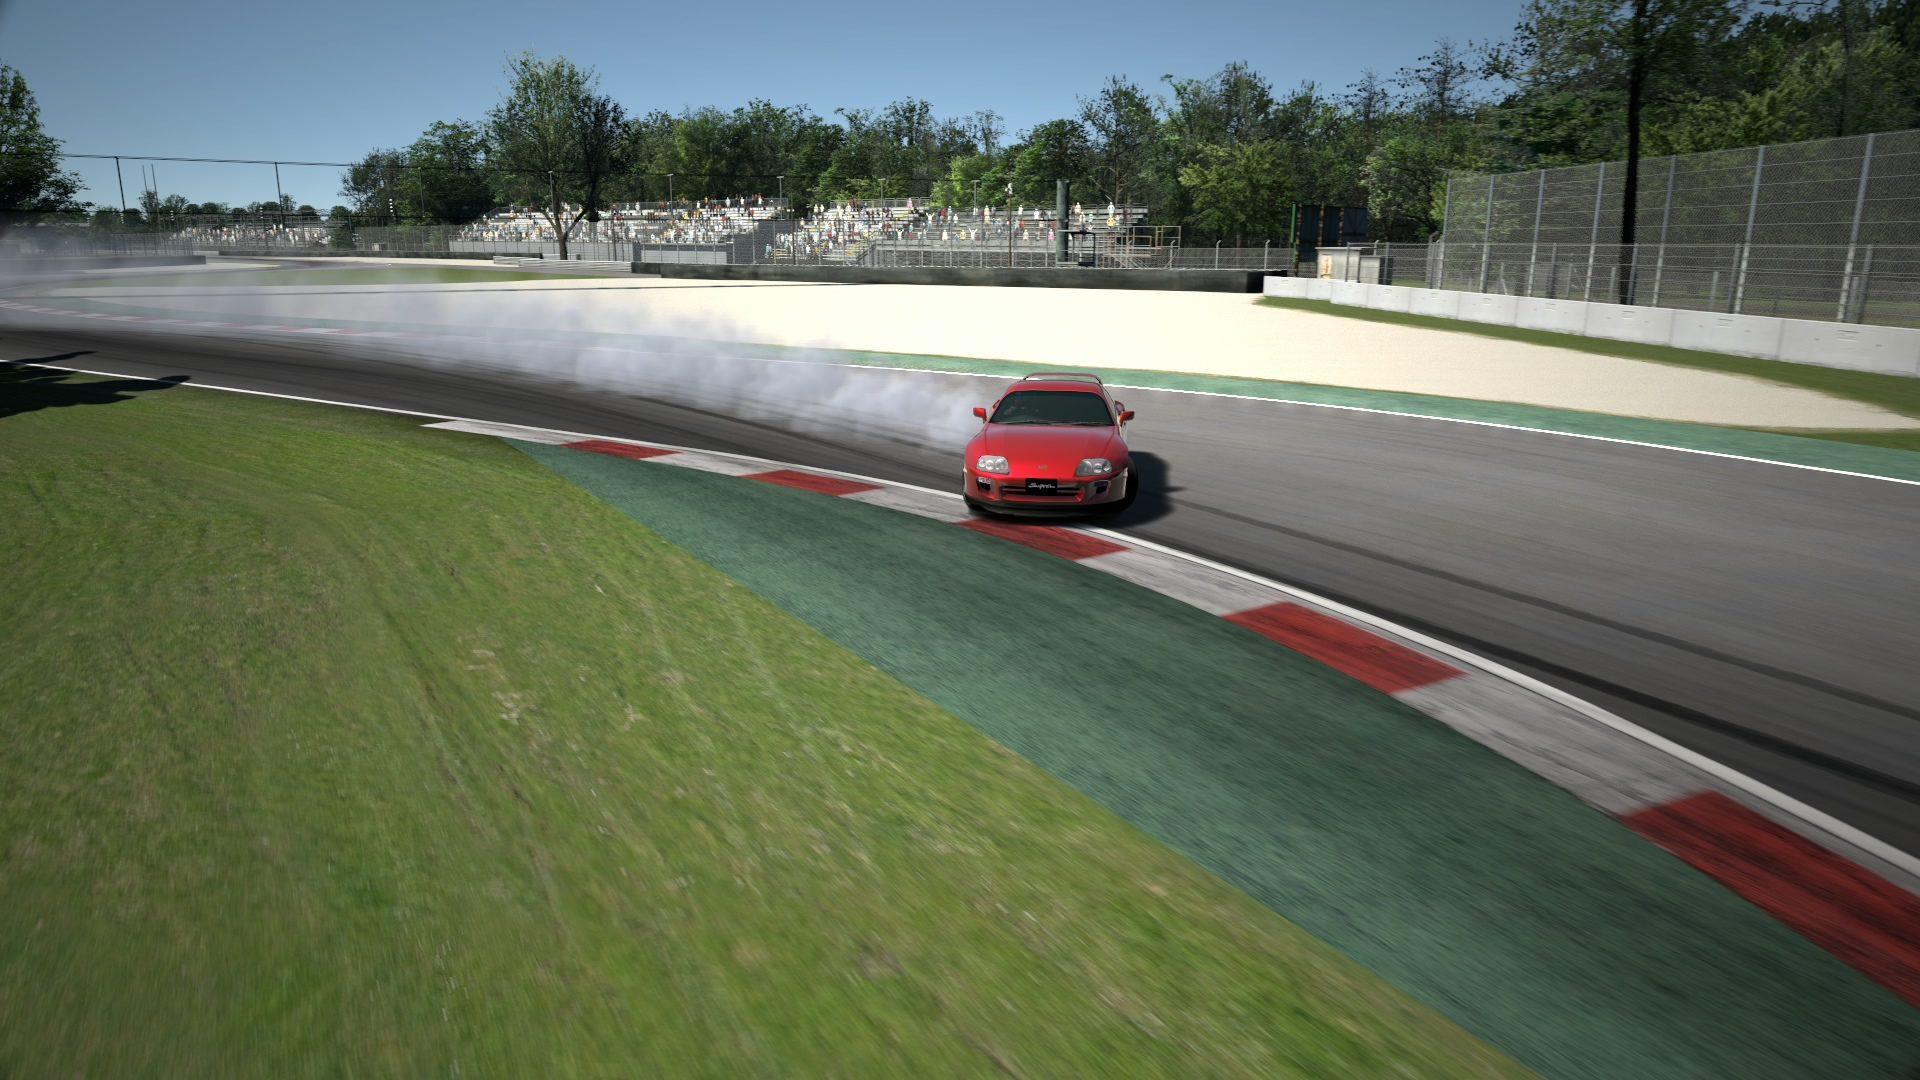 Autodromo Nazionale Monza_7.jpg